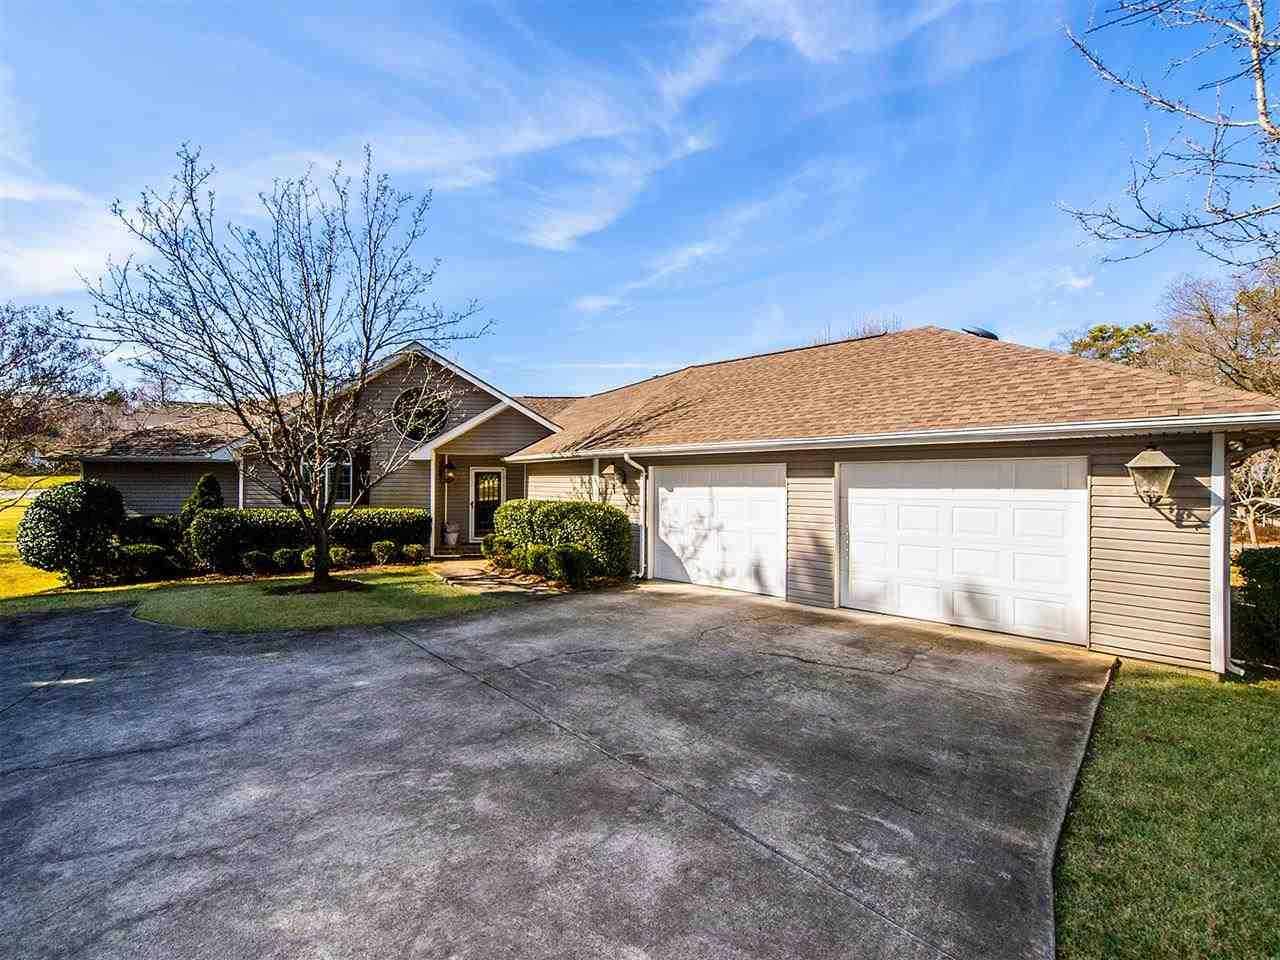 Single Family Home for Sale, ListingId:31518717, location: 4408 Sol Aberman Rock Hill 29732